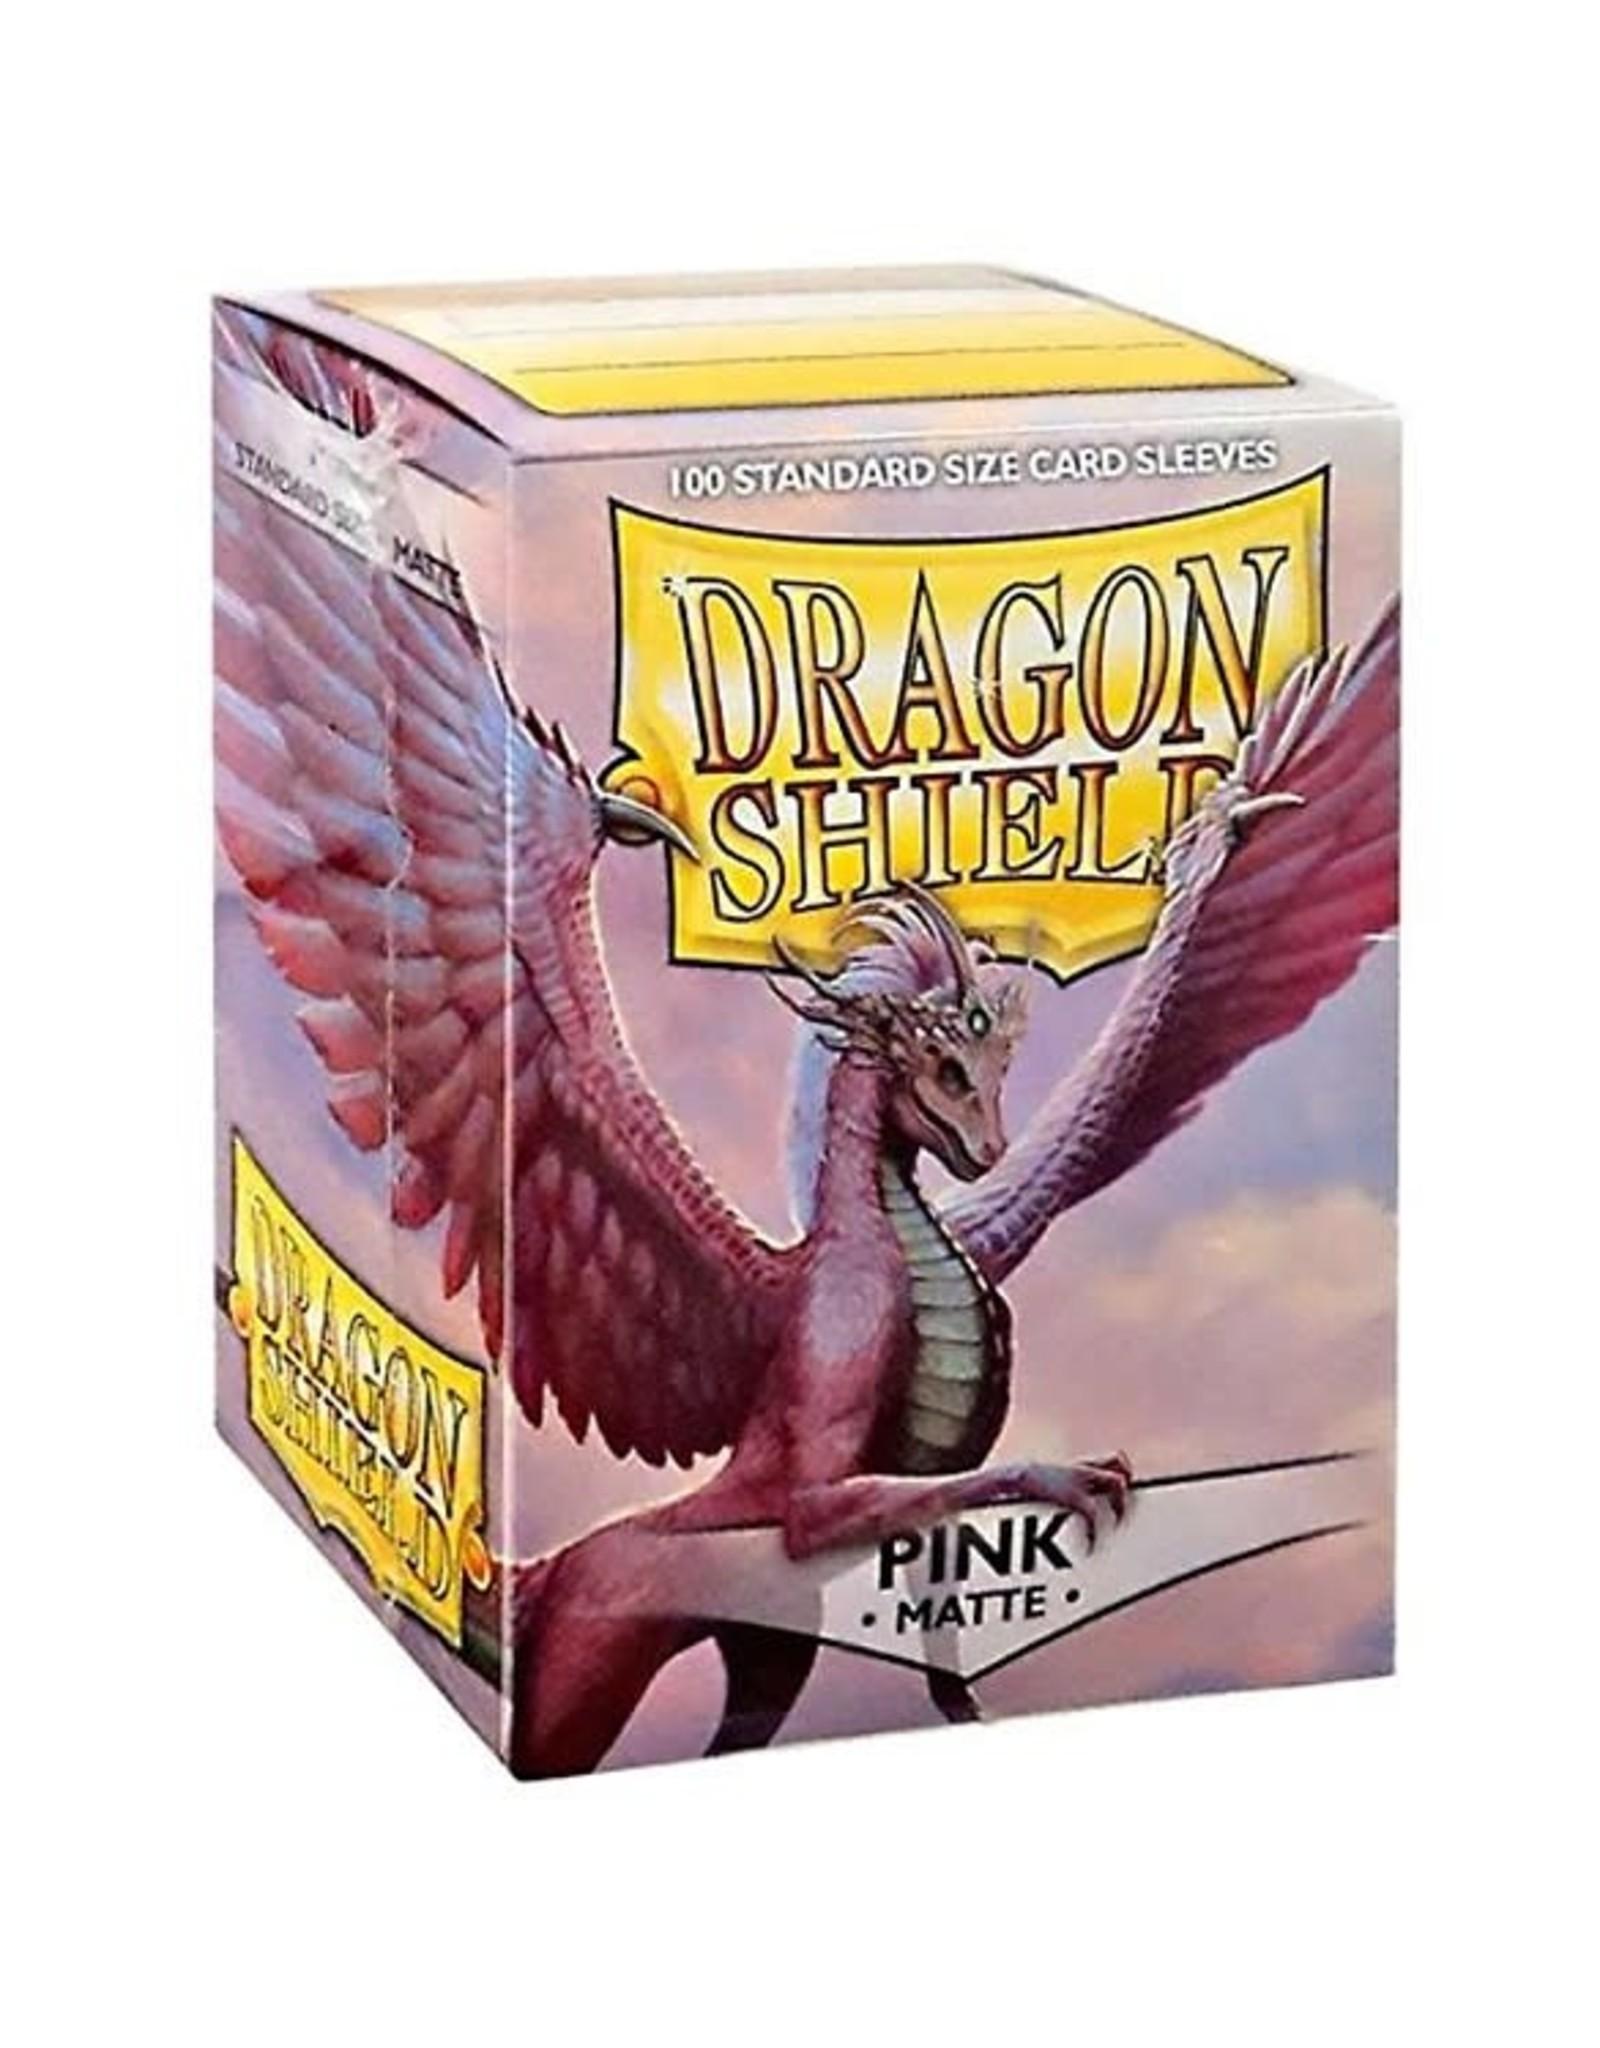 Dragon Shield Dragon Shield Matte Pink Card Sleeves (100)